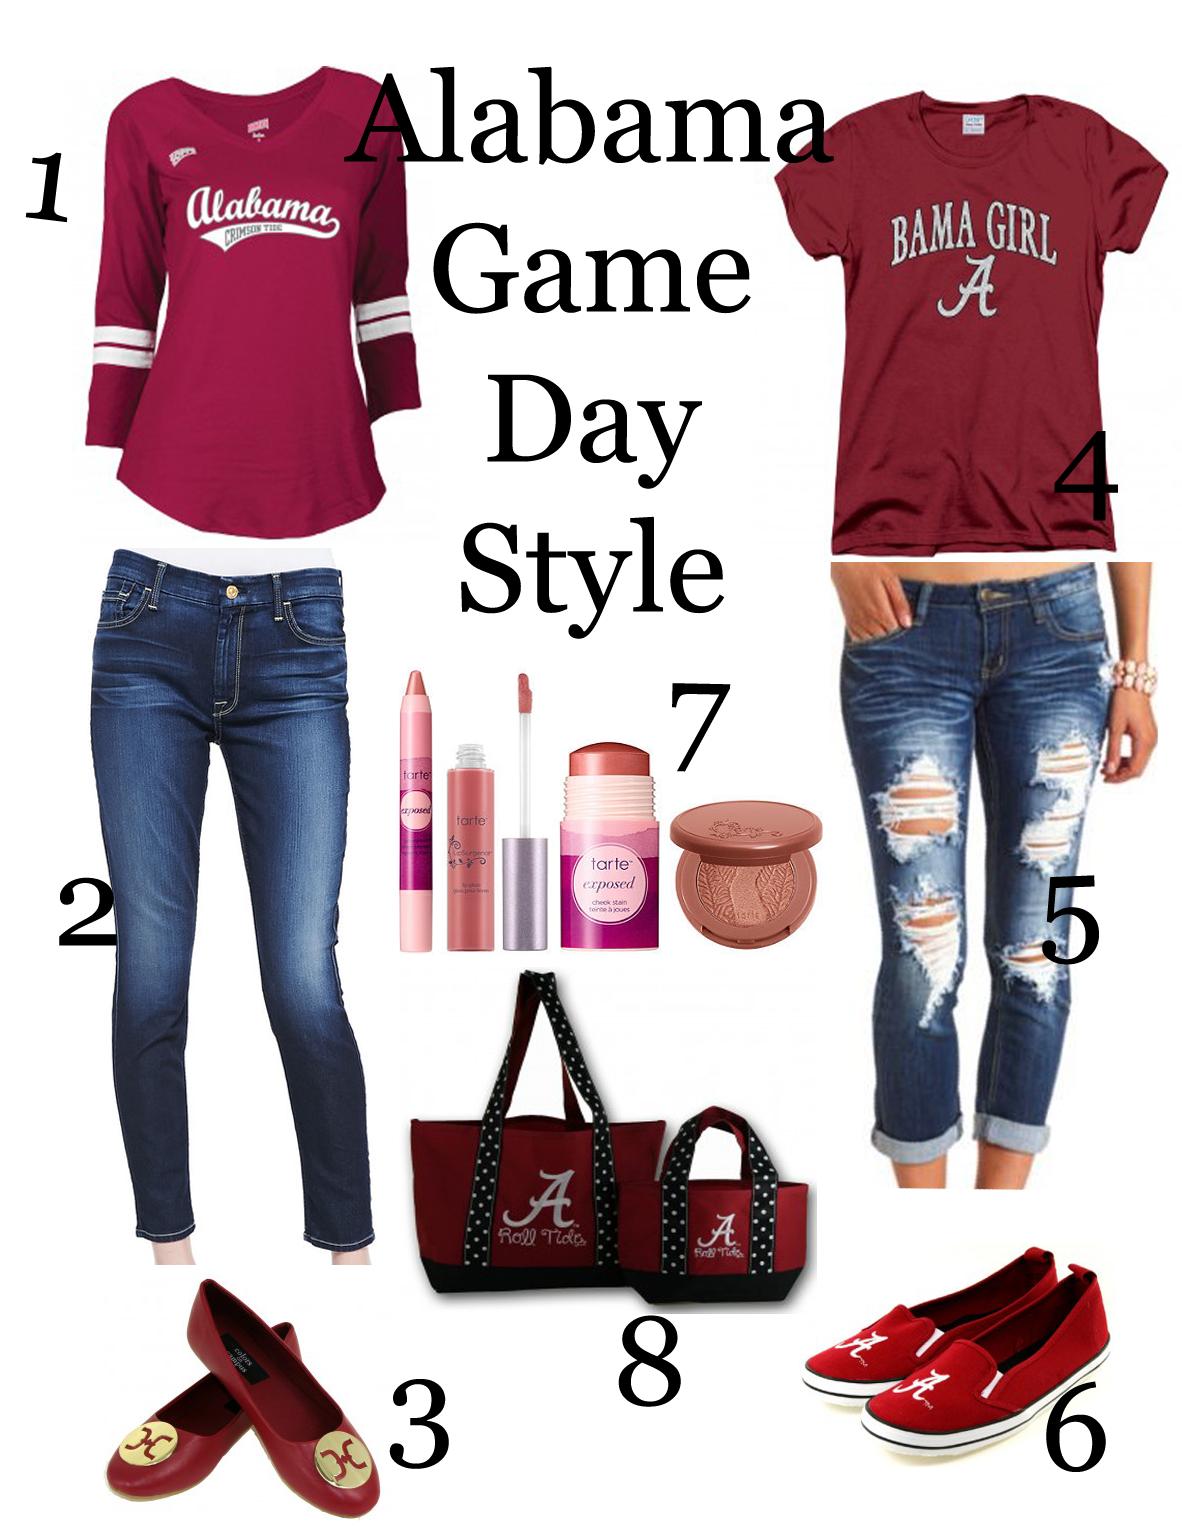 Alabama Game Day Style Ensemble